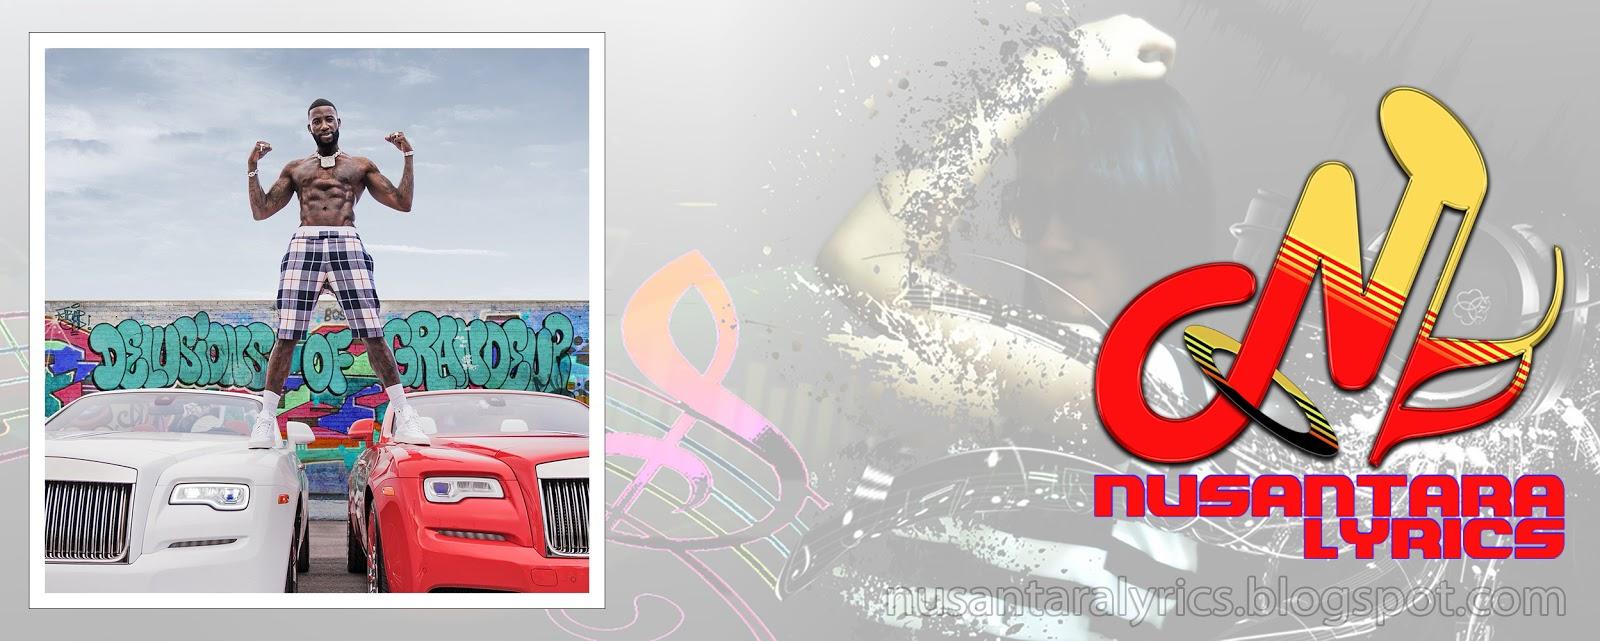 Album Gucci Mane - Delusions of Grandeur (2019) - Nusantara